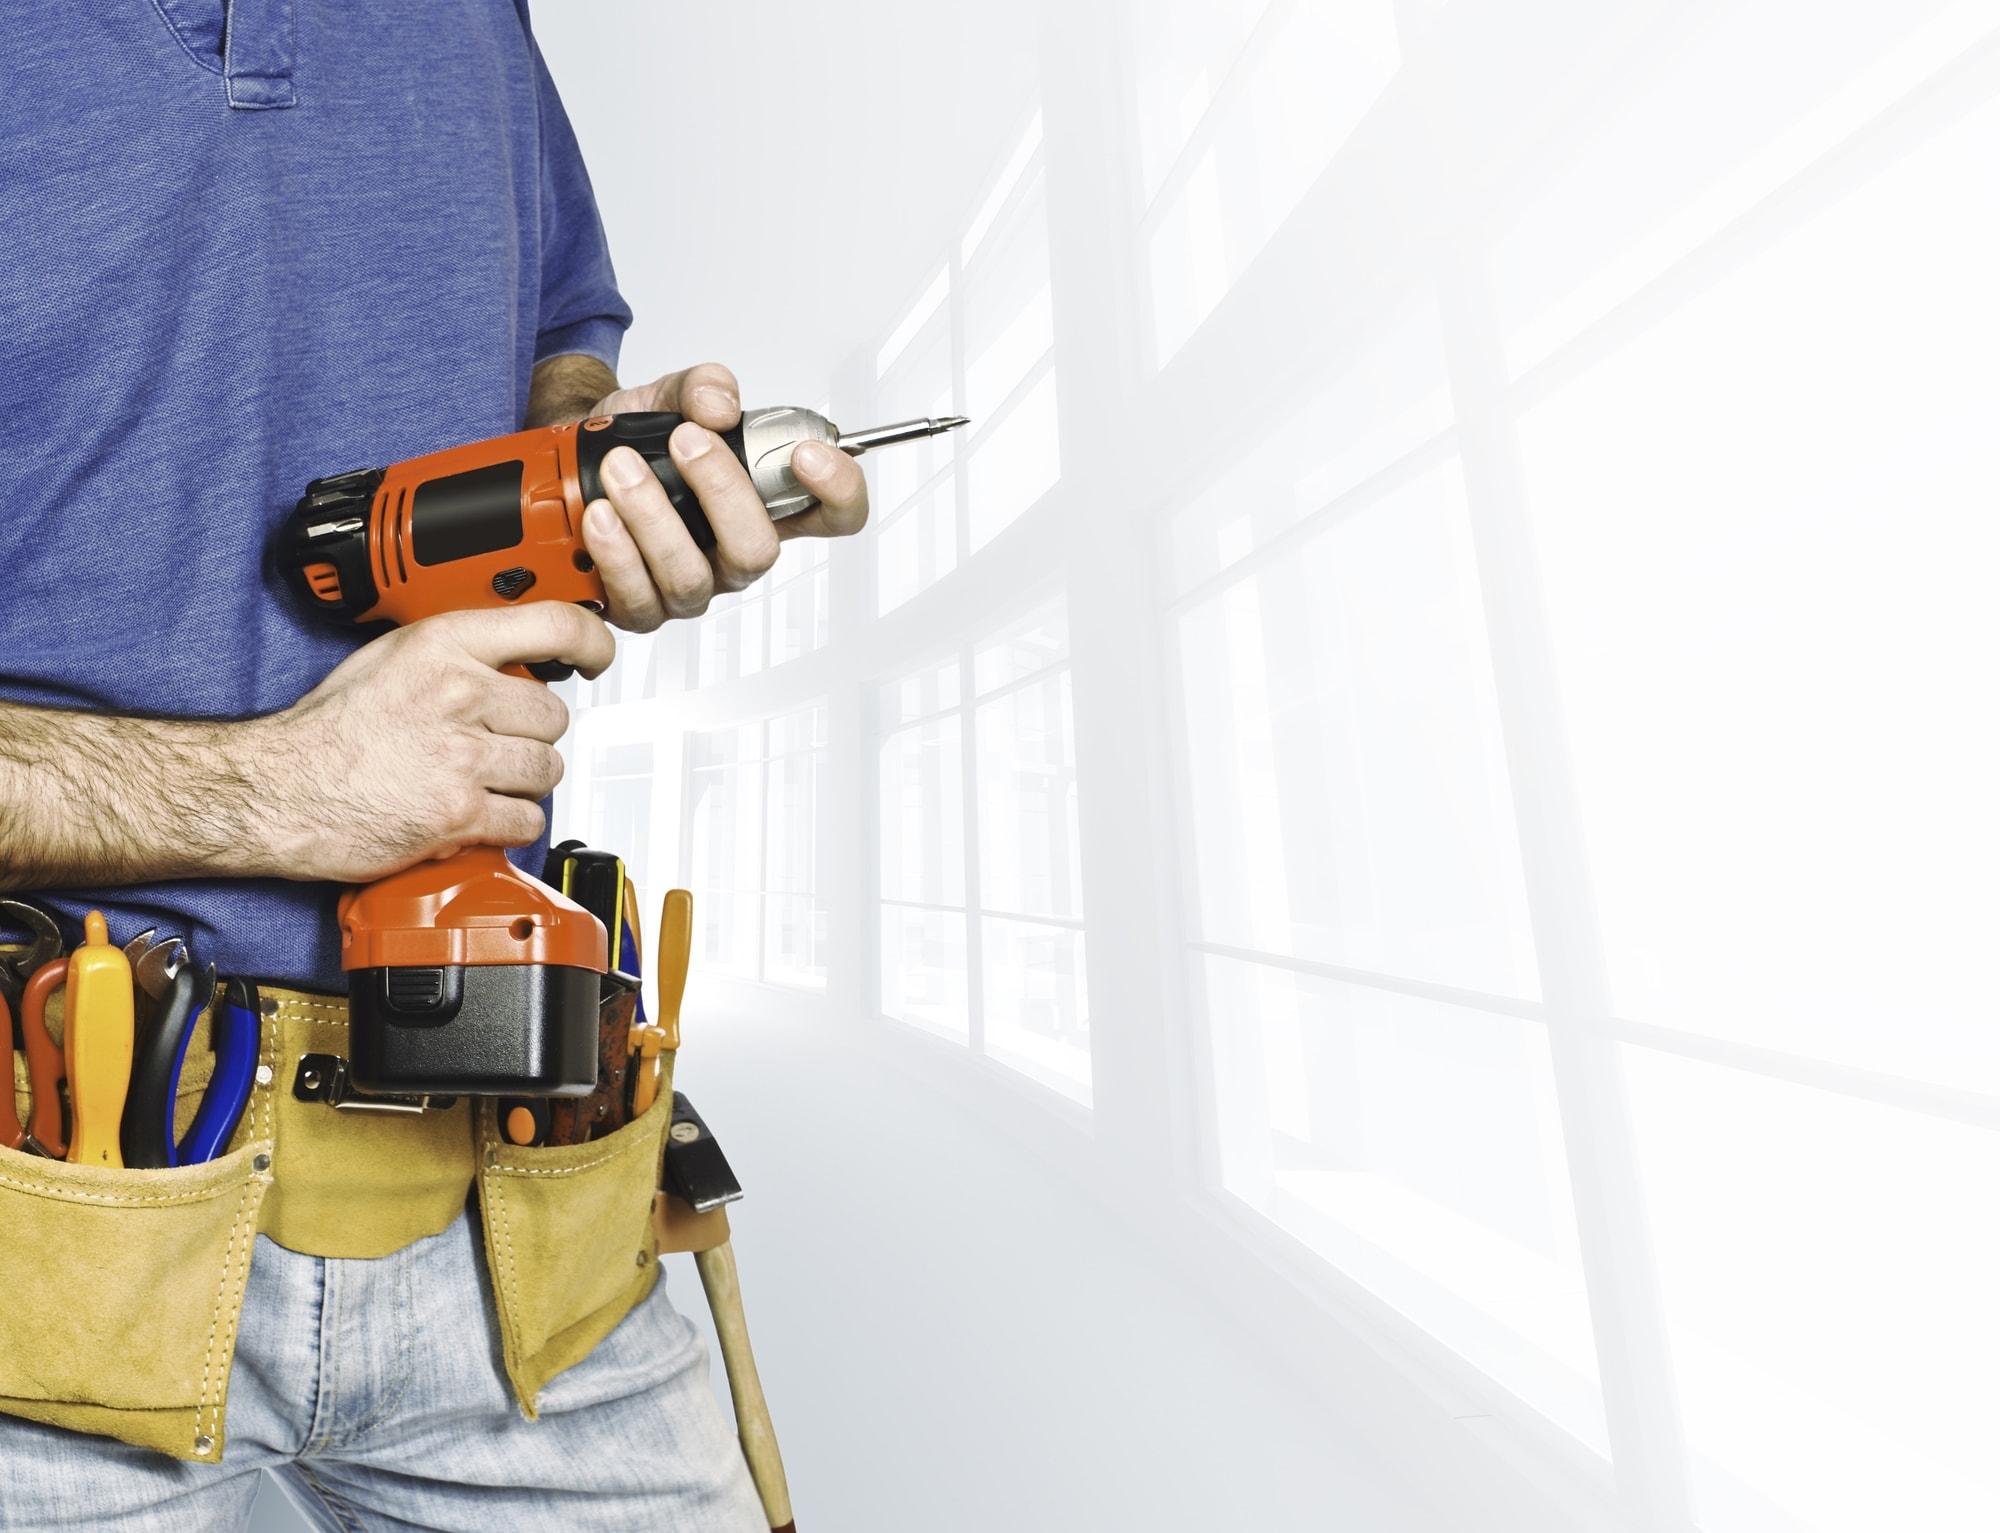 Man holding a screwdriver